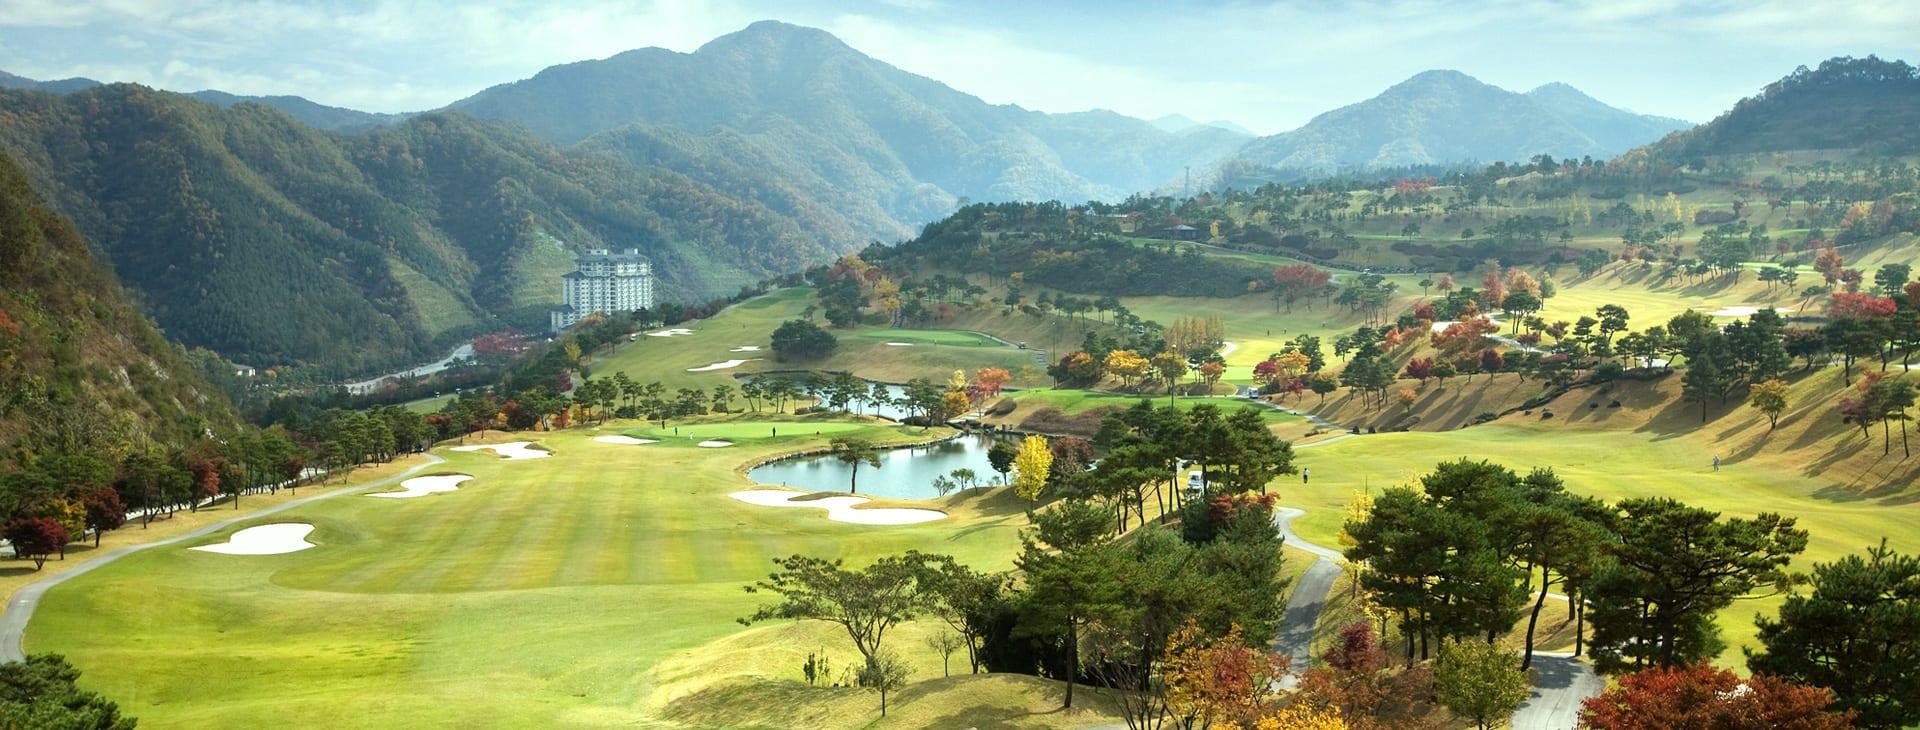 Elysian Gangchon Resort | Chuncheon, Gangwon-do